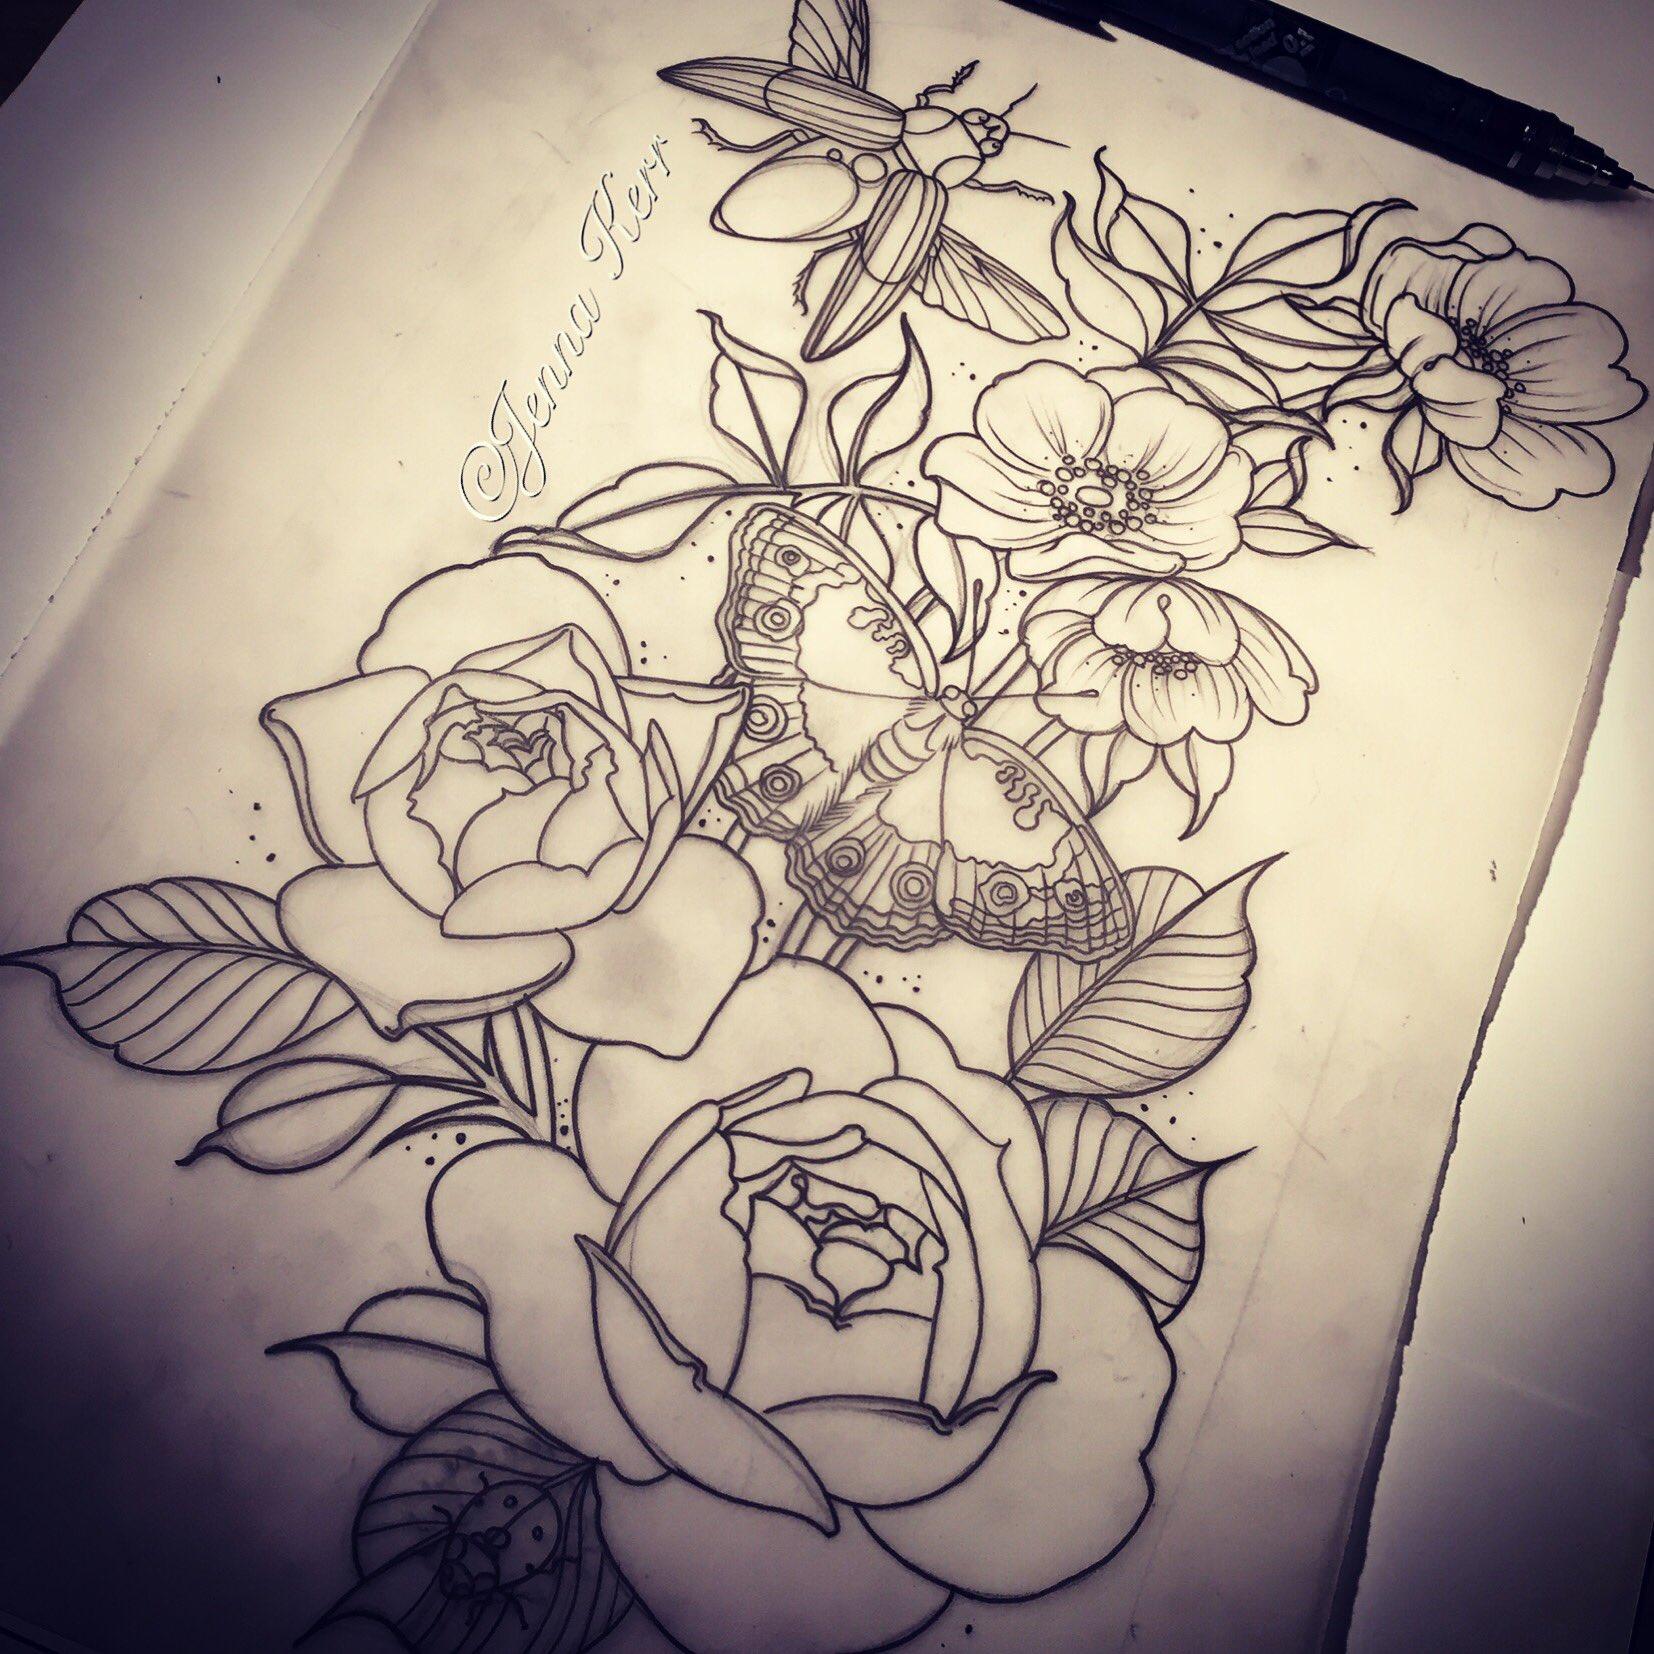 jenna kerr on twitter today 39 s piece vintage tattoo tattoo jewels roses botanicals. Black Bedroom Furniture Sets. Home Design Ideas